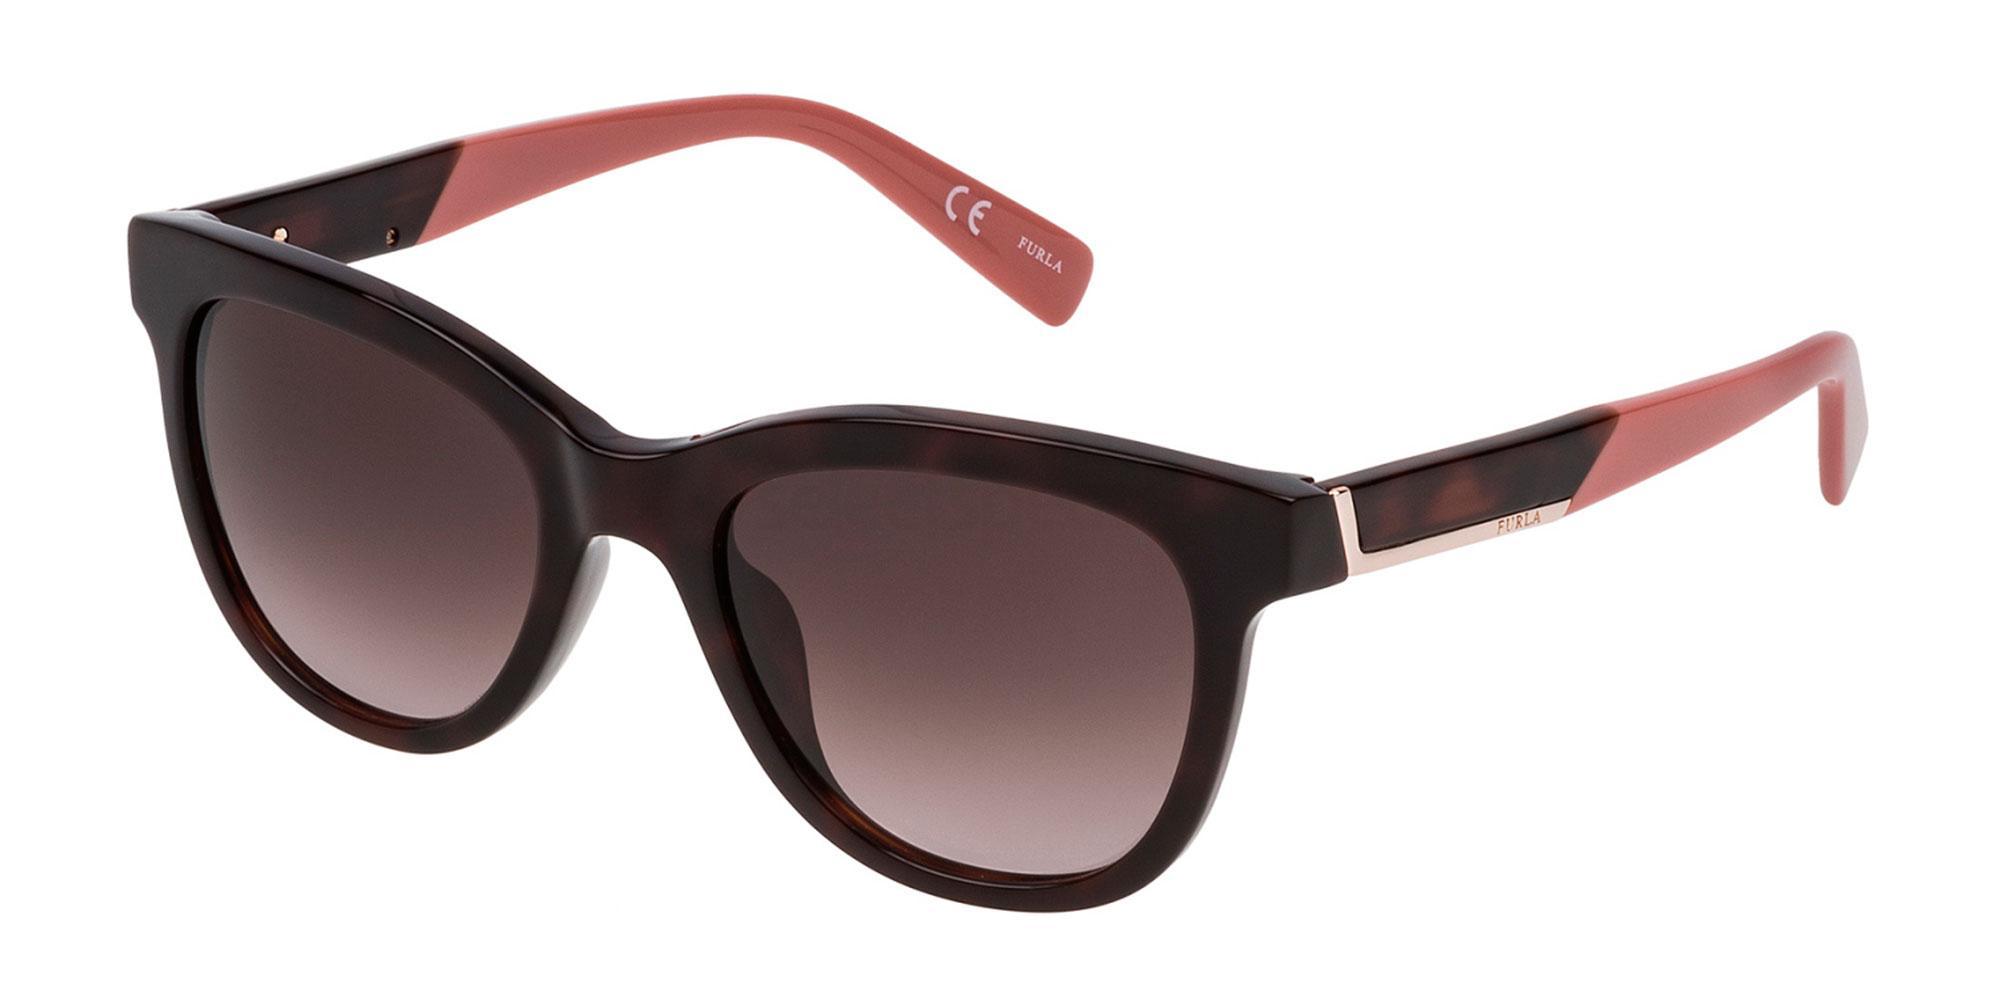 09XK SFU039 Sunglasses, Furla